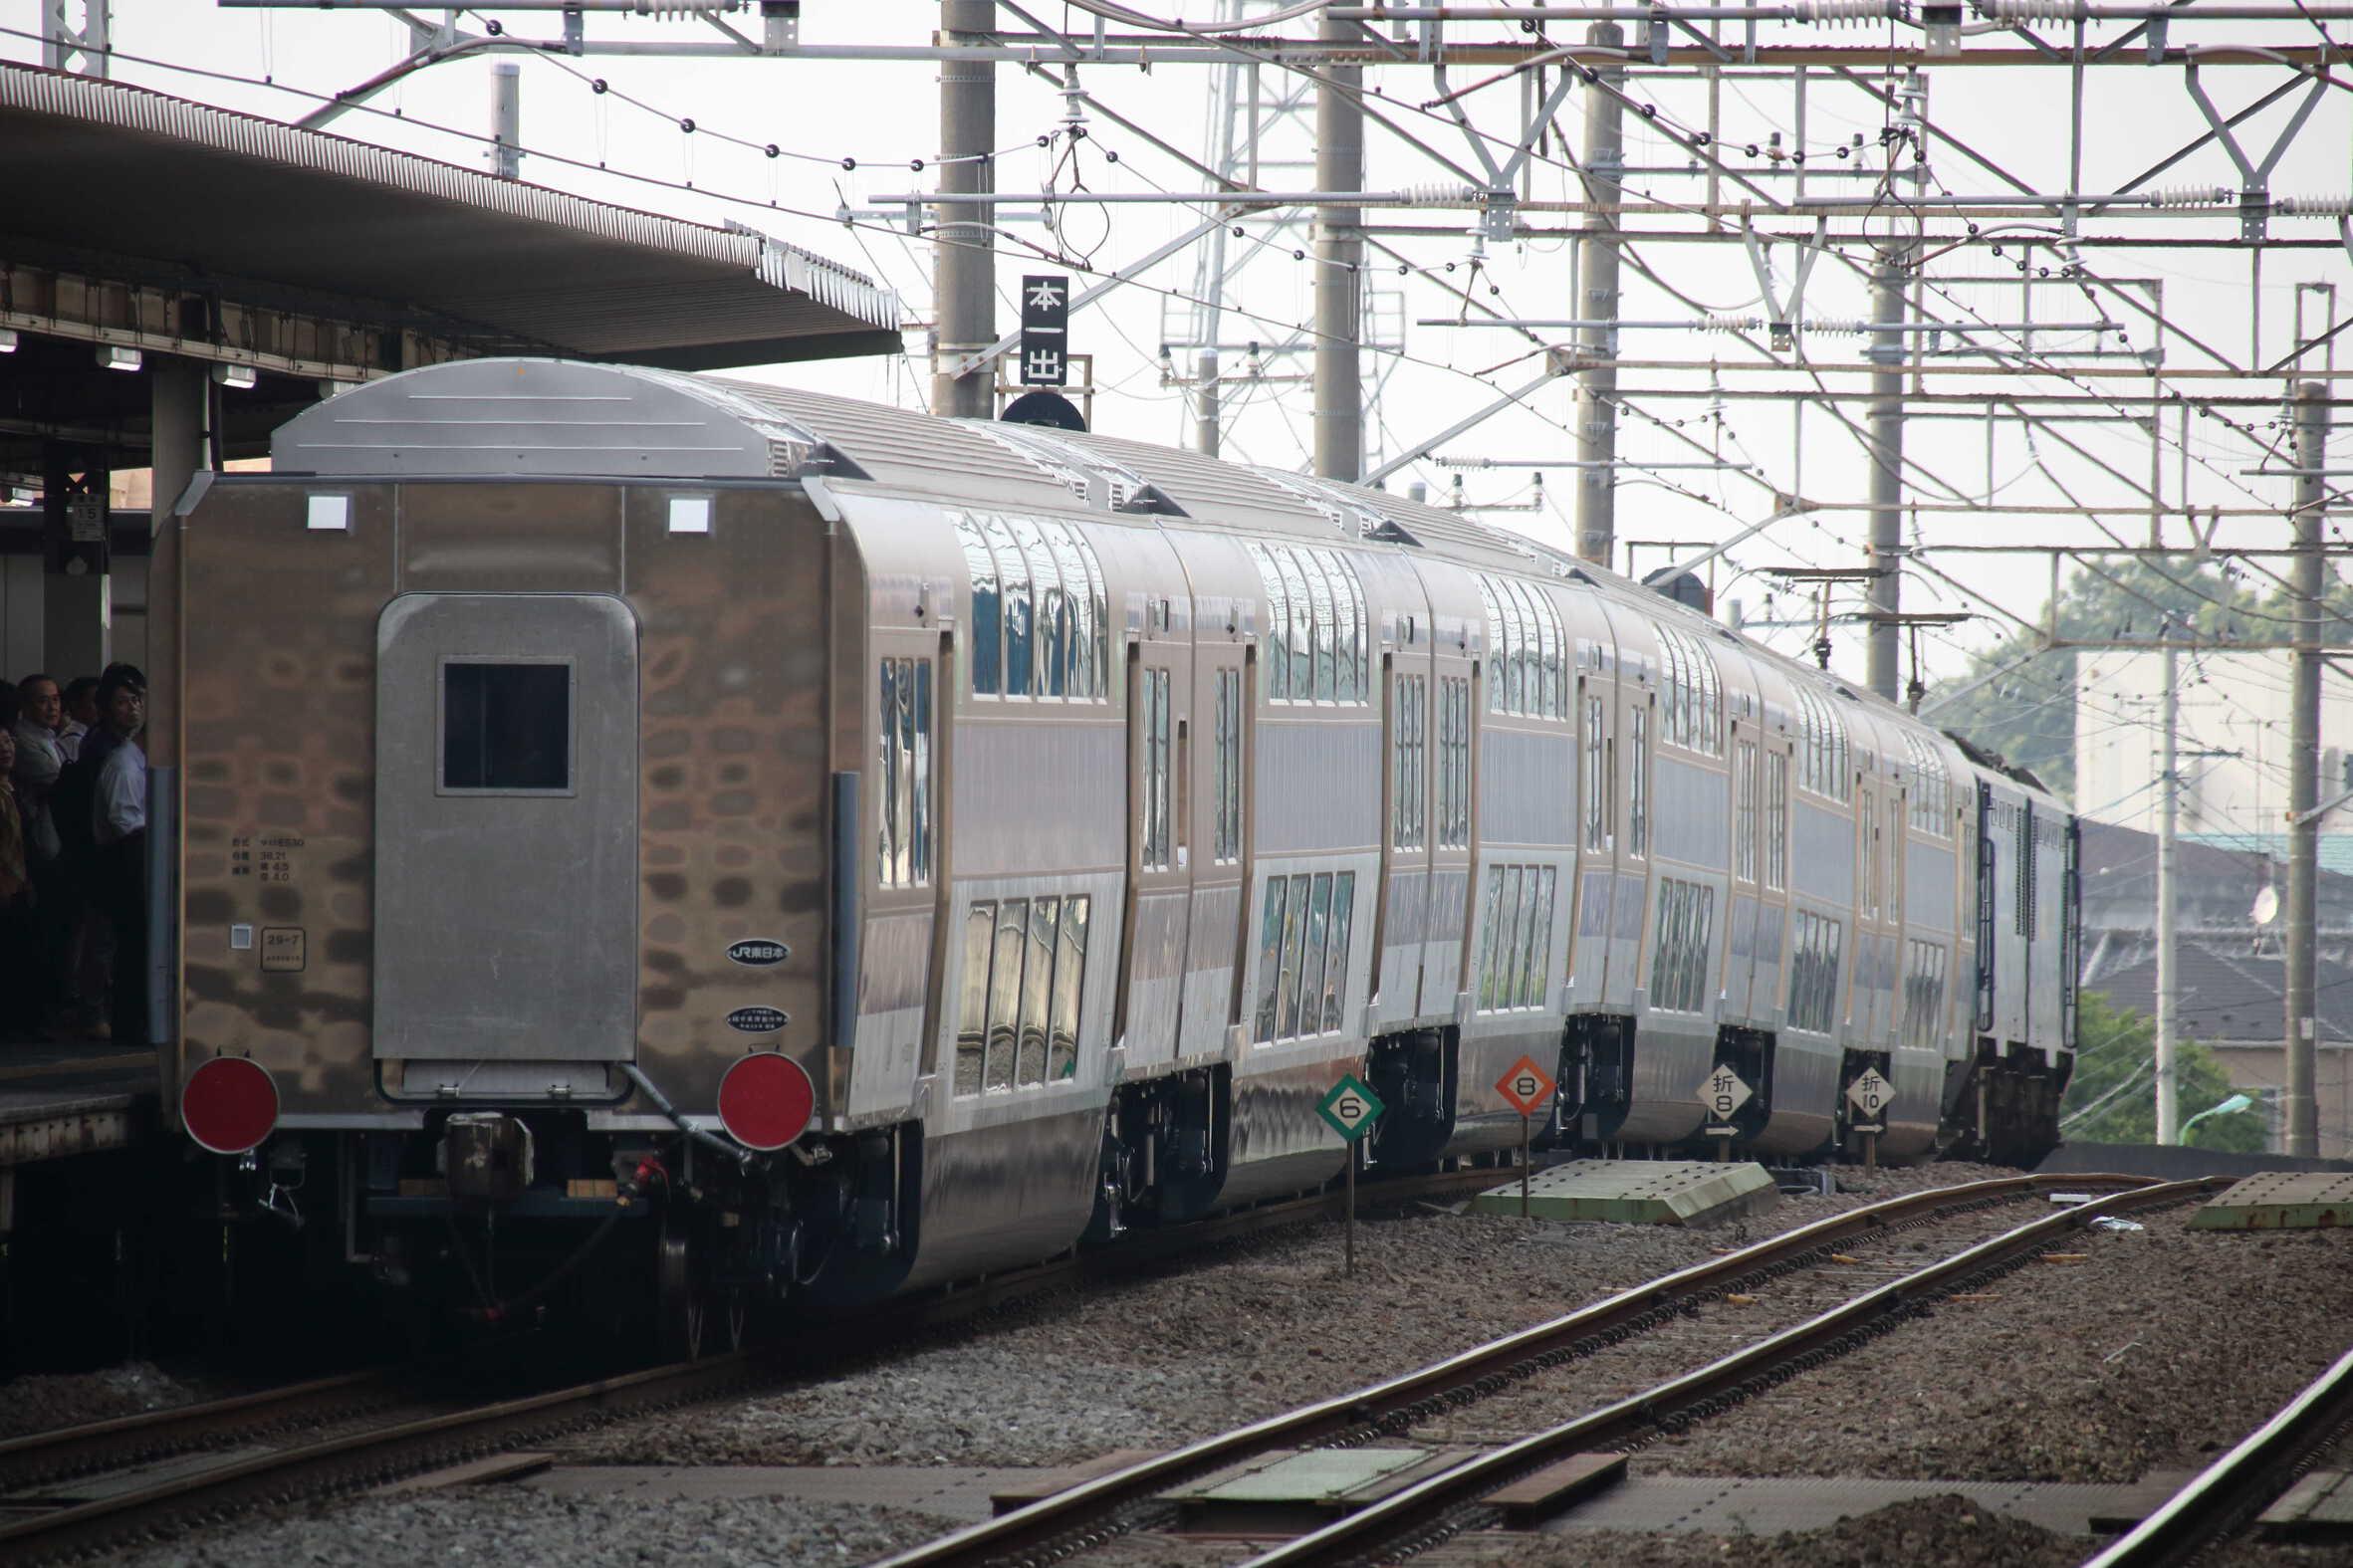 9771列車 甲56(逗子〜新津) E531系グリーン車 J-TREC横浜事業所出場甲種輸送 EH200-5②[高]+サロE531-26+サロE530-26+サロE531-25+サロE530-25+サロE531-24+サロE530-24